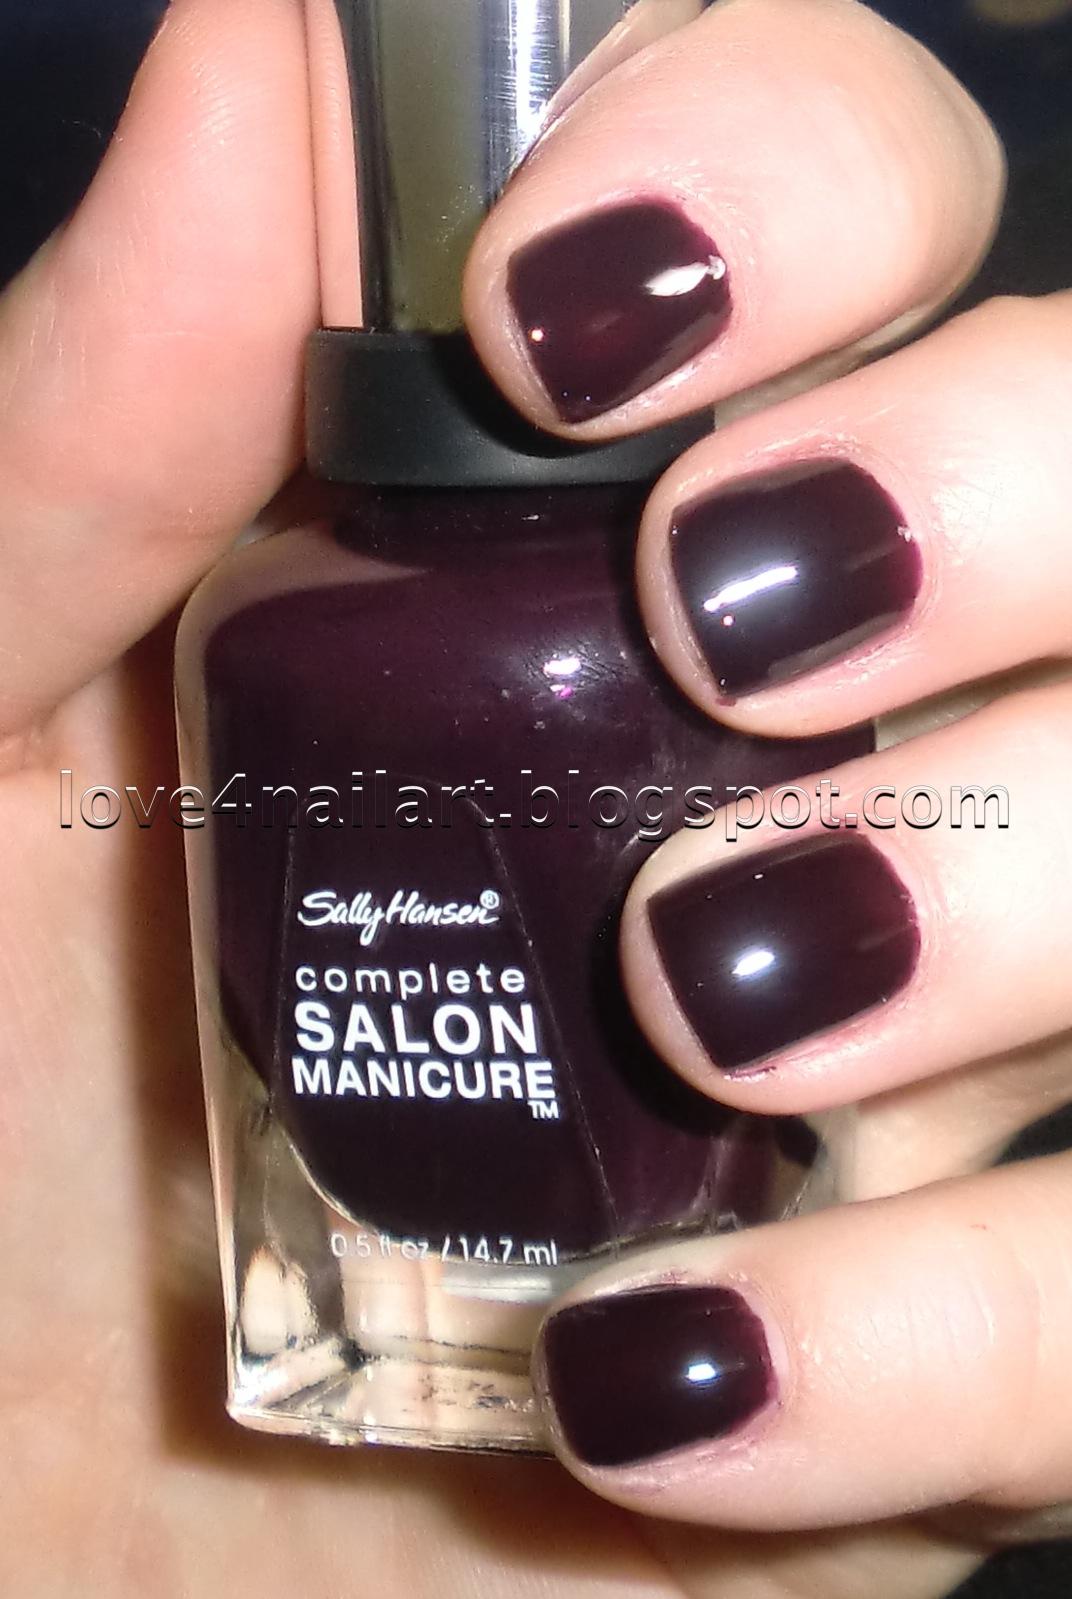 Love4NailArt: Sally Hansen Complete Salon Manicure Nail Polish